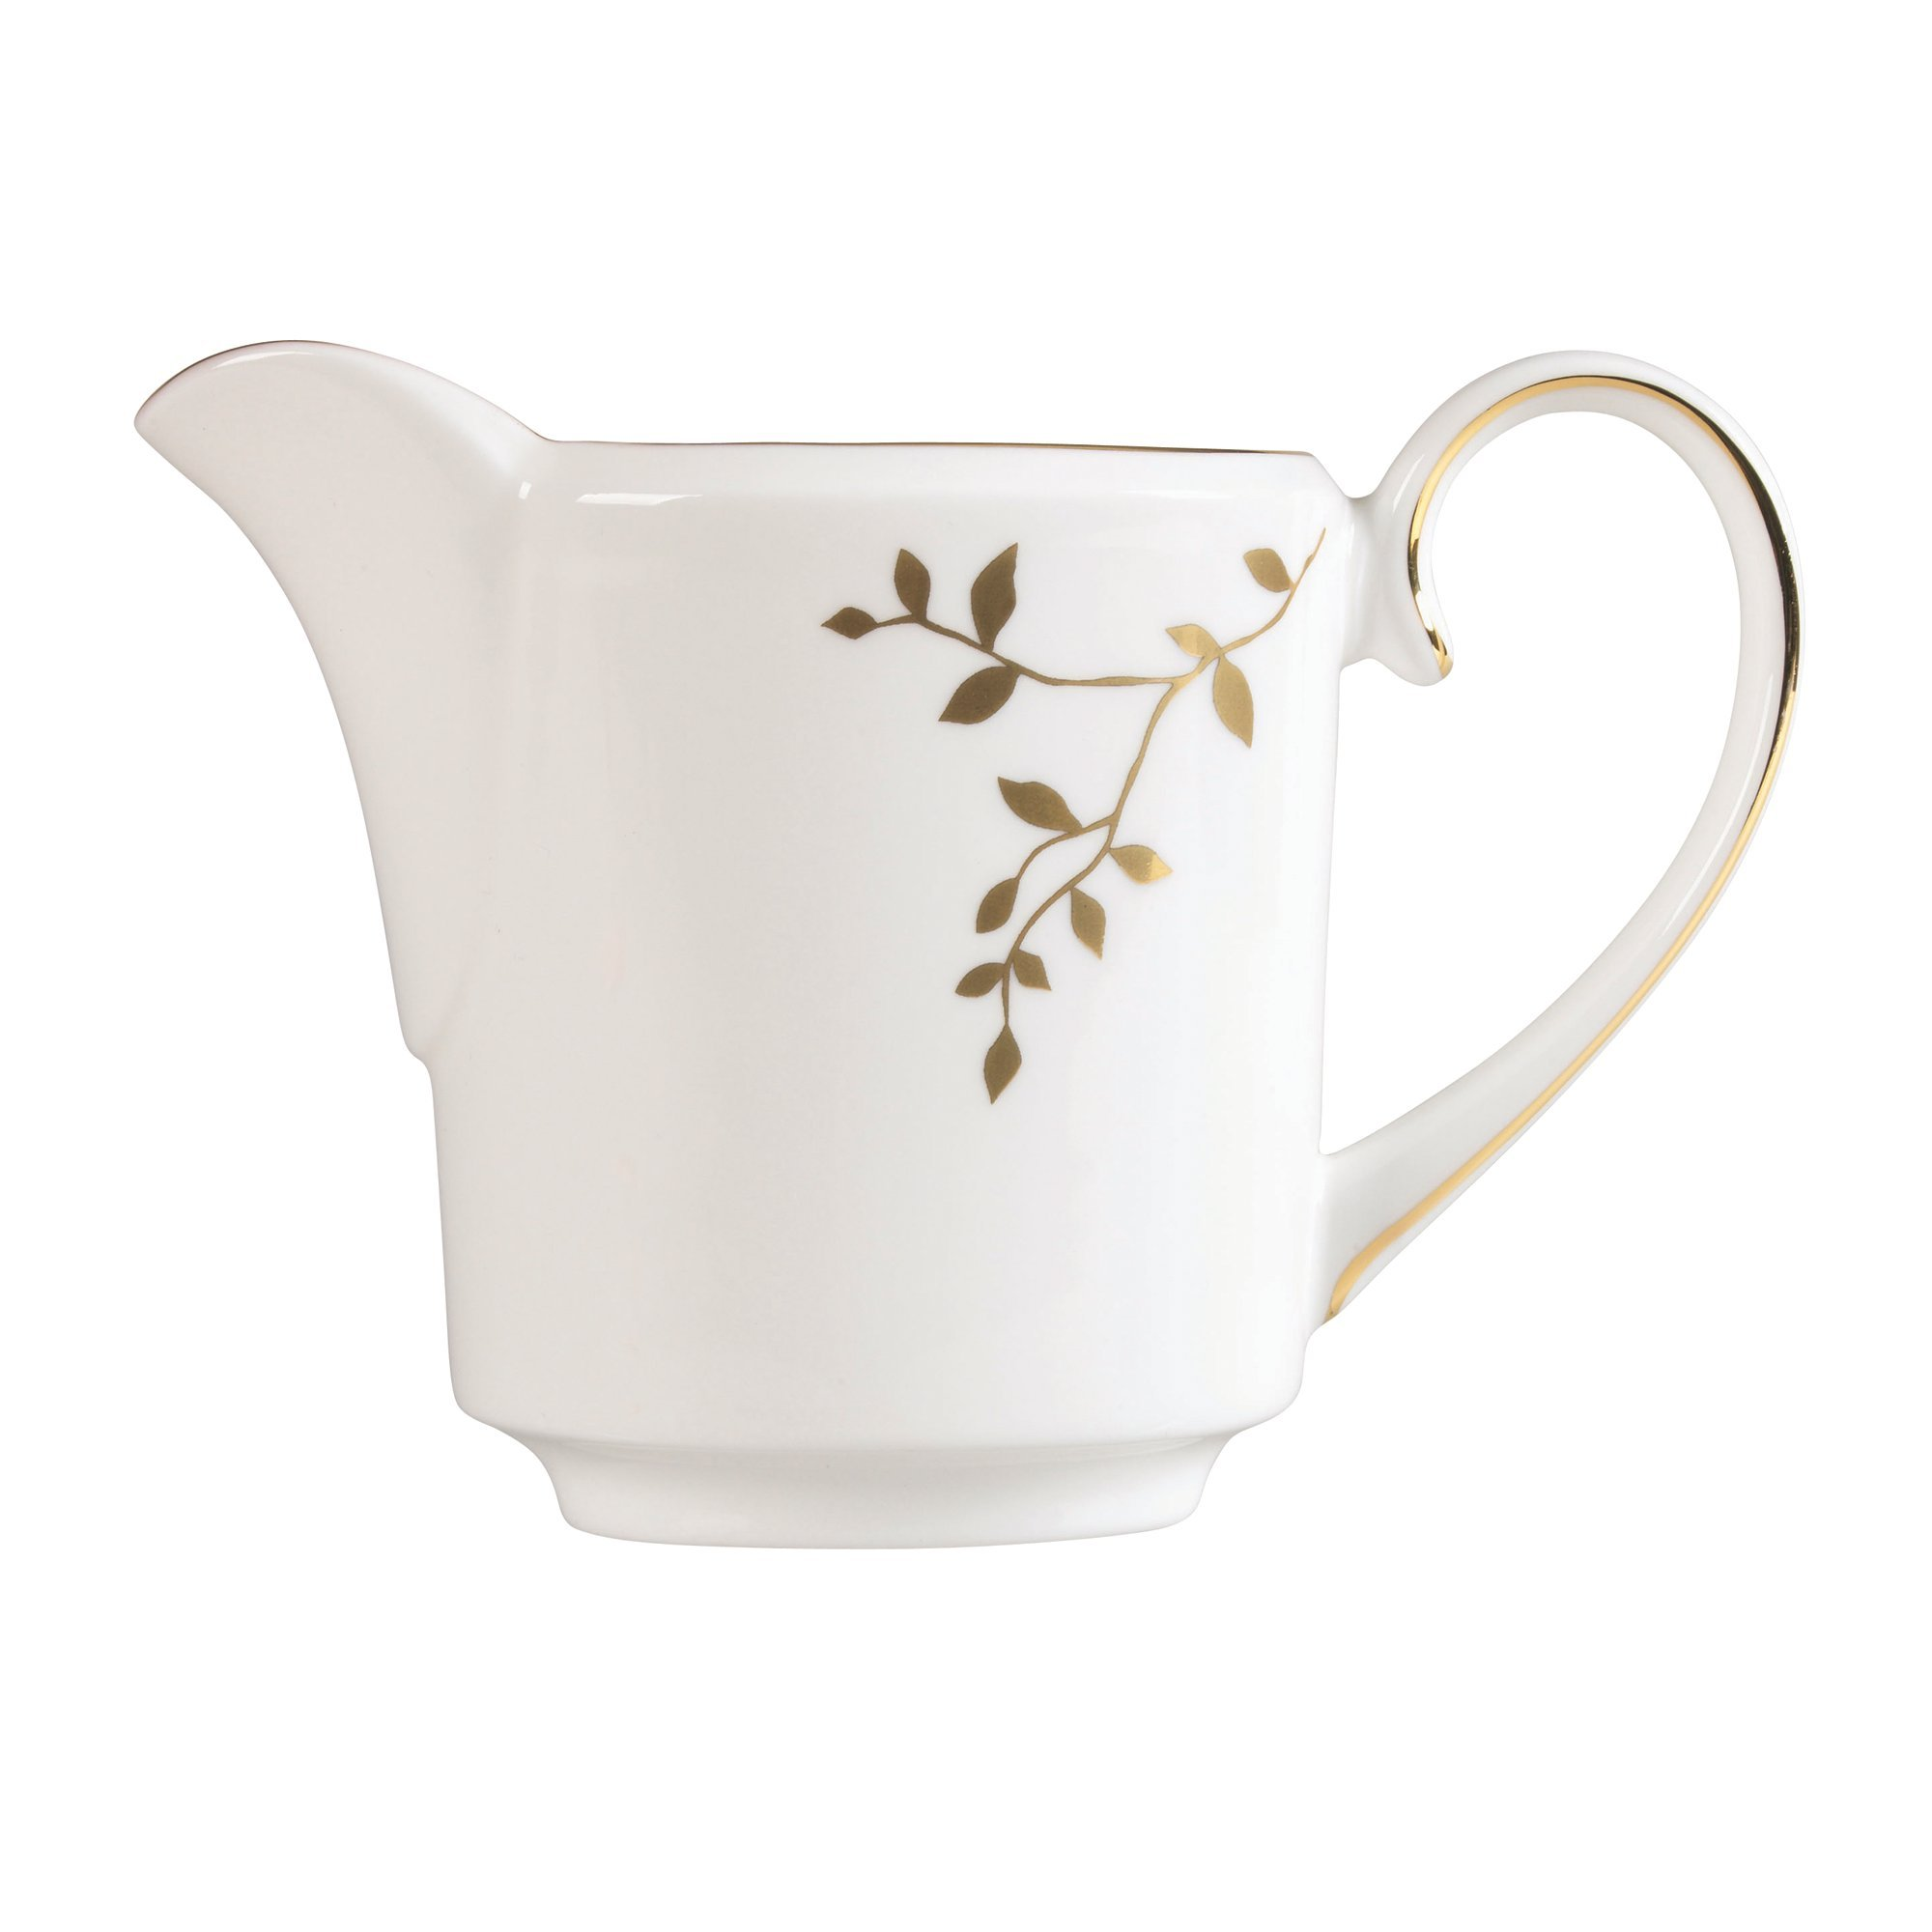 Wedgwood Gilded Leaf Creamer Imperial, White